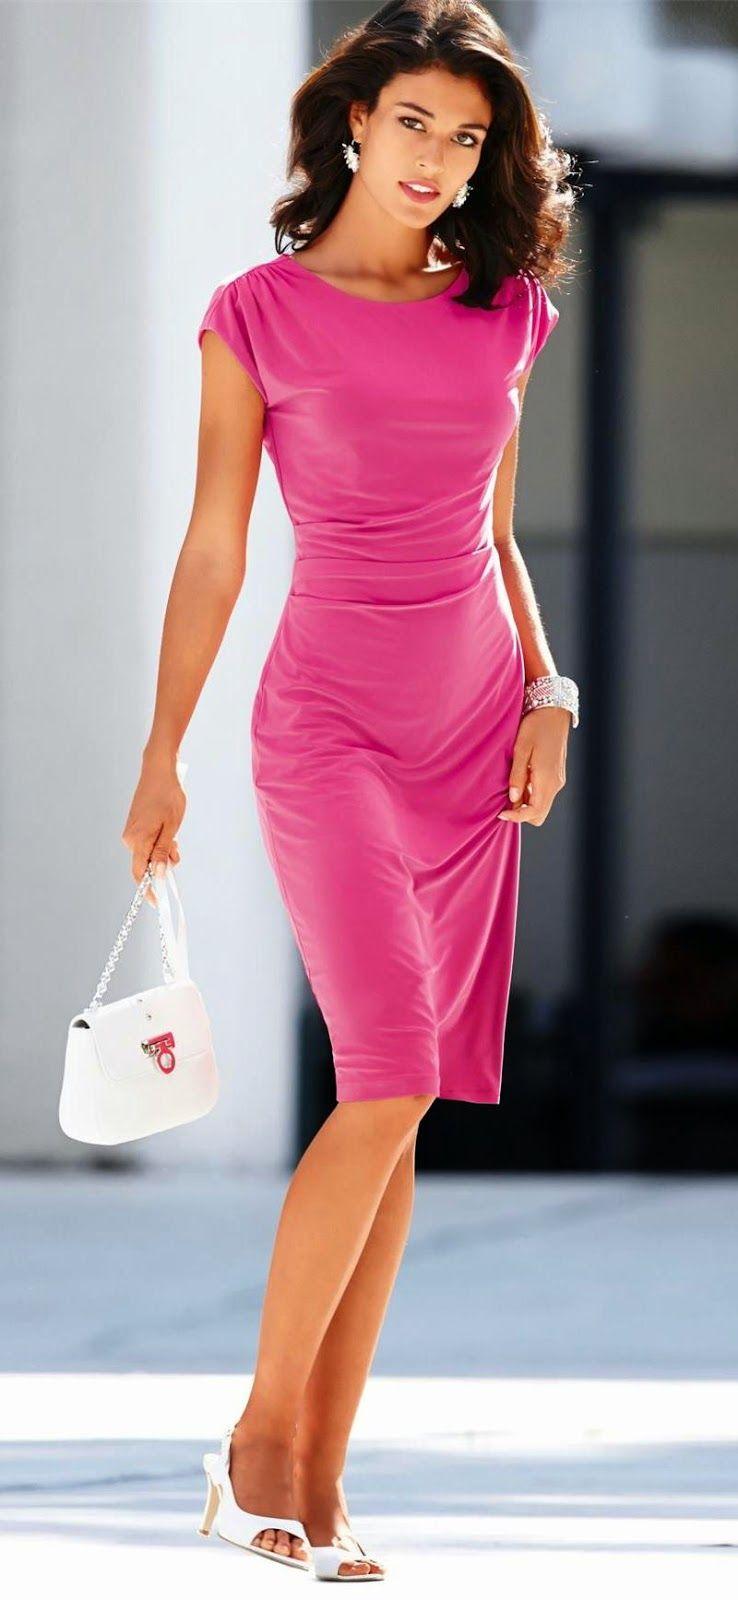 MADELEINE PINK DRESS | Dresses - short sleeved | Pinterest ...